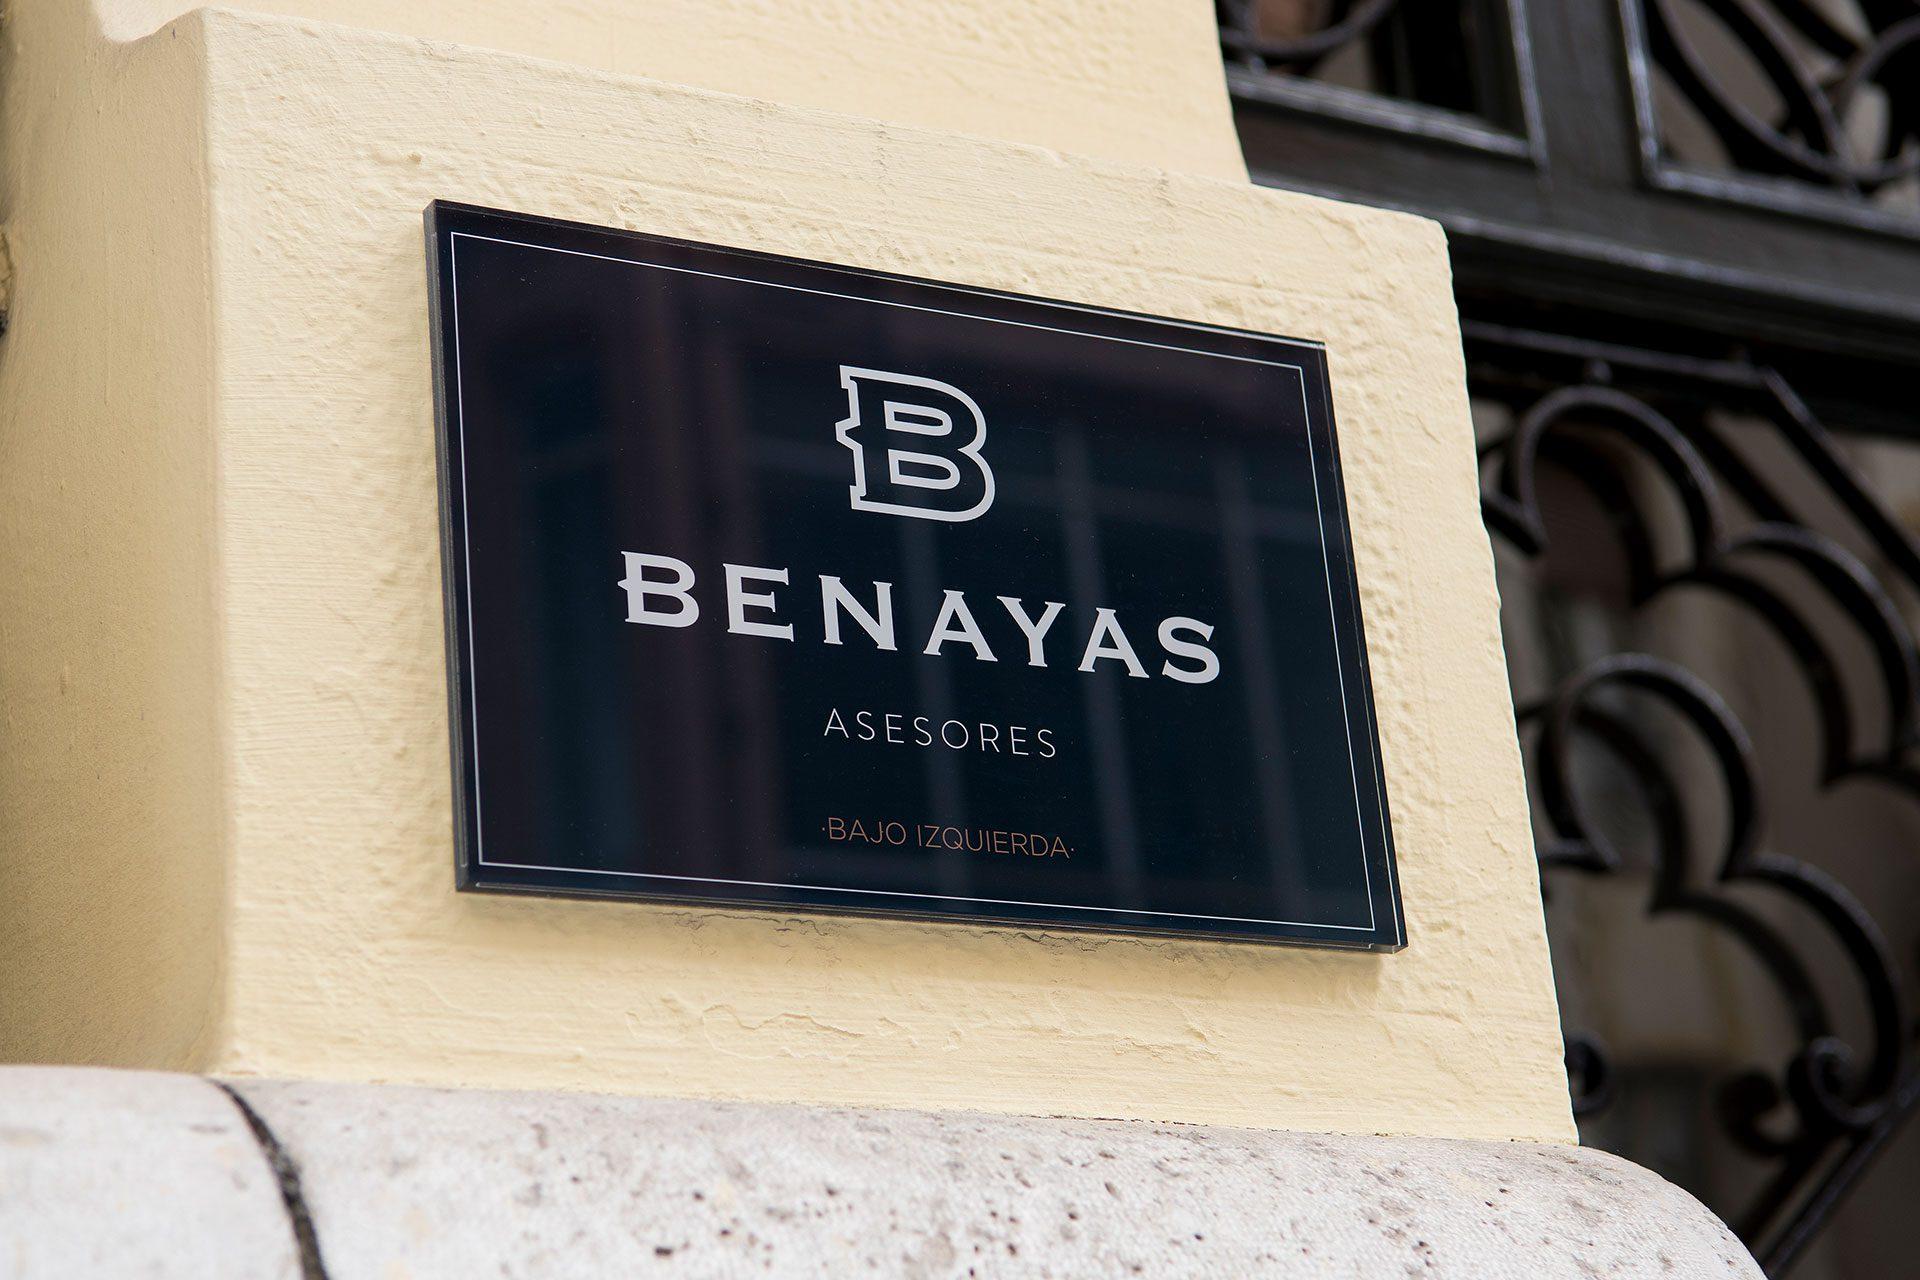 Placa Benayas Asesores